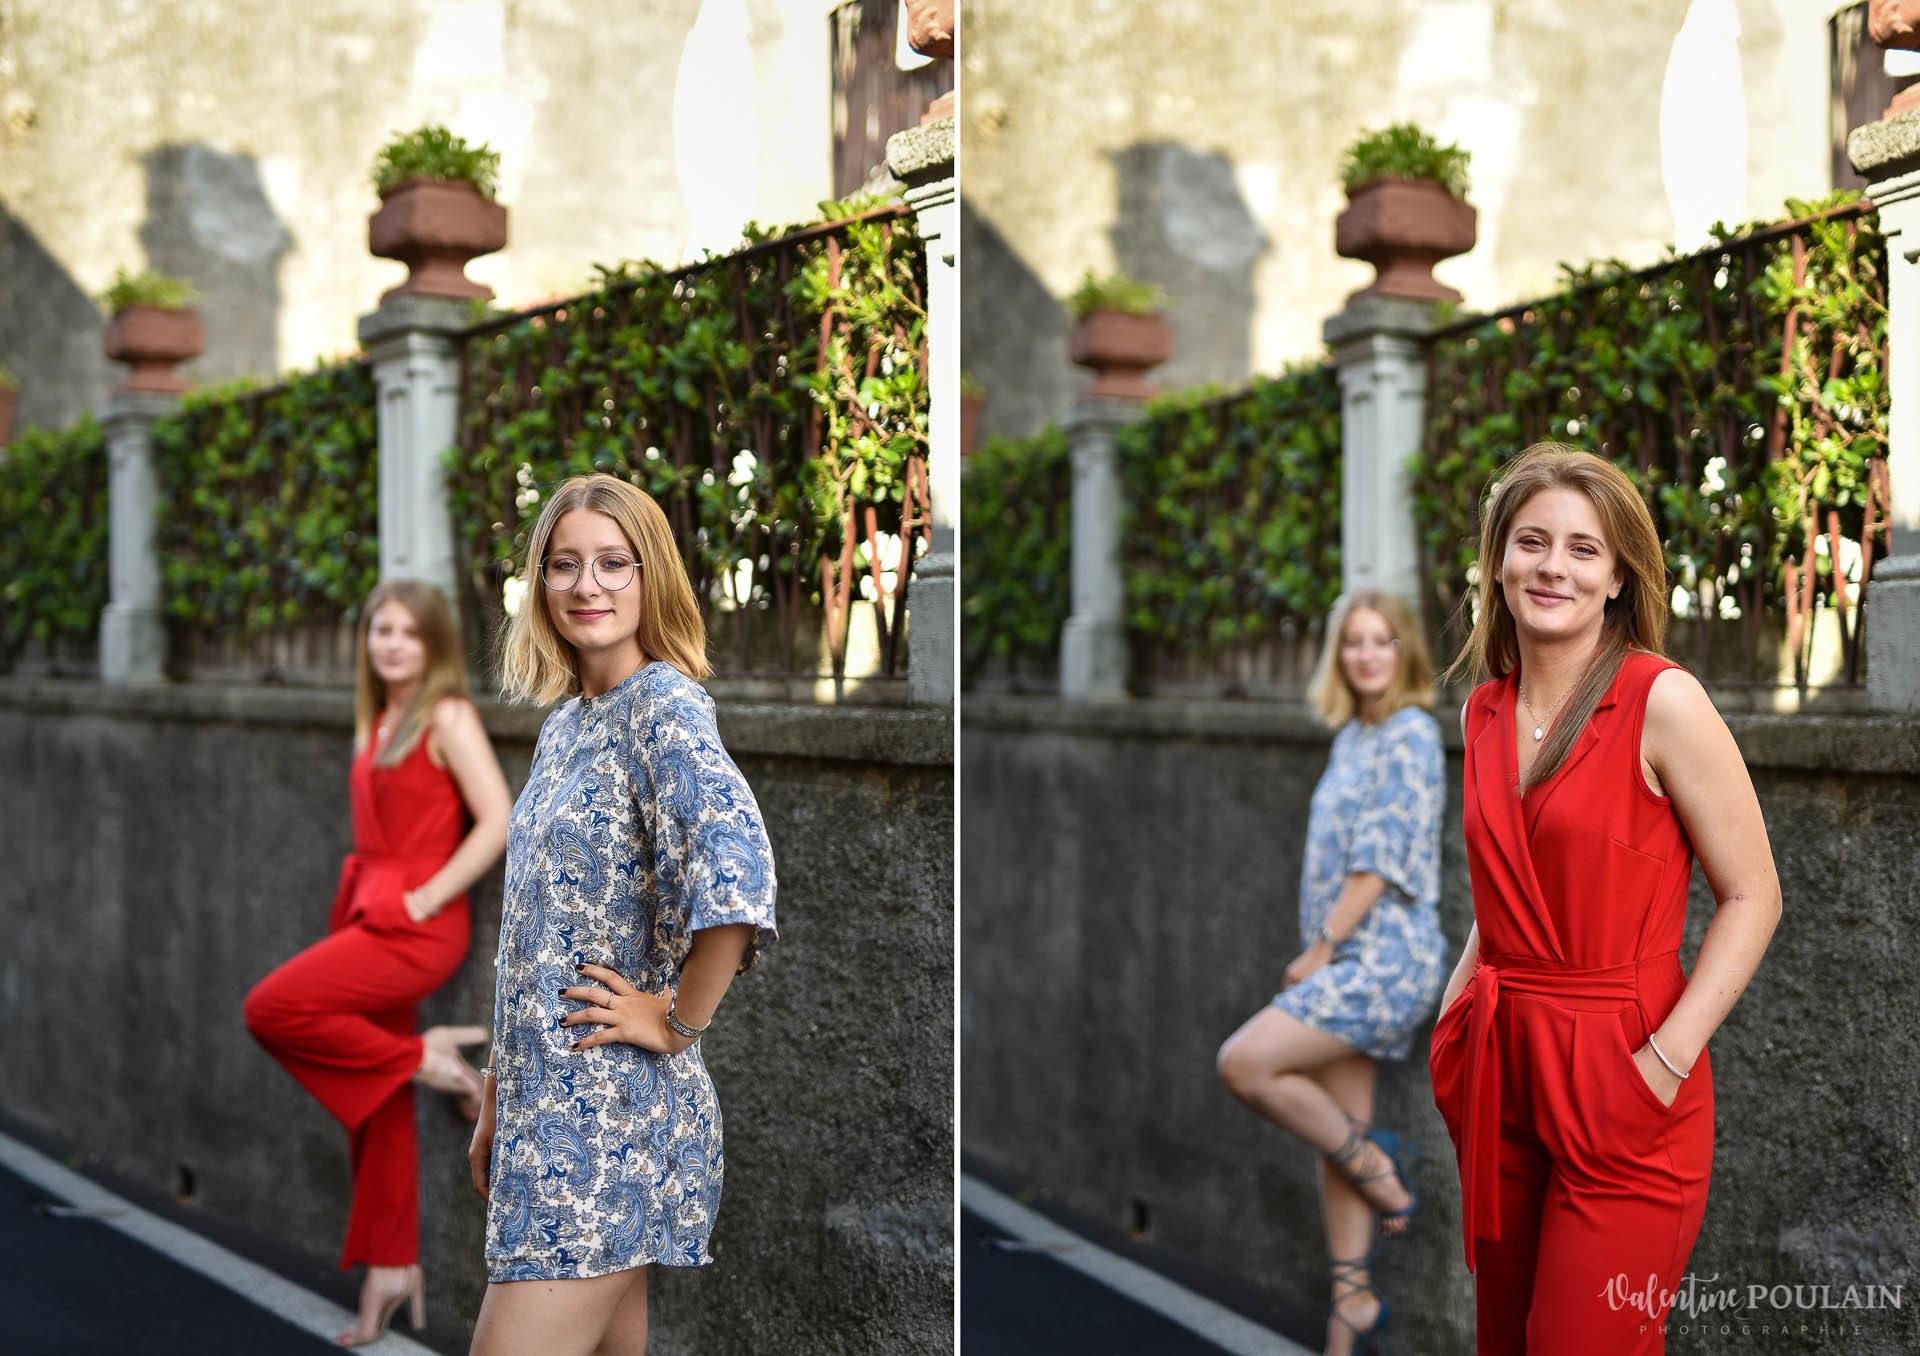 Shooting soeurs Italie - Valentine Poulain poses